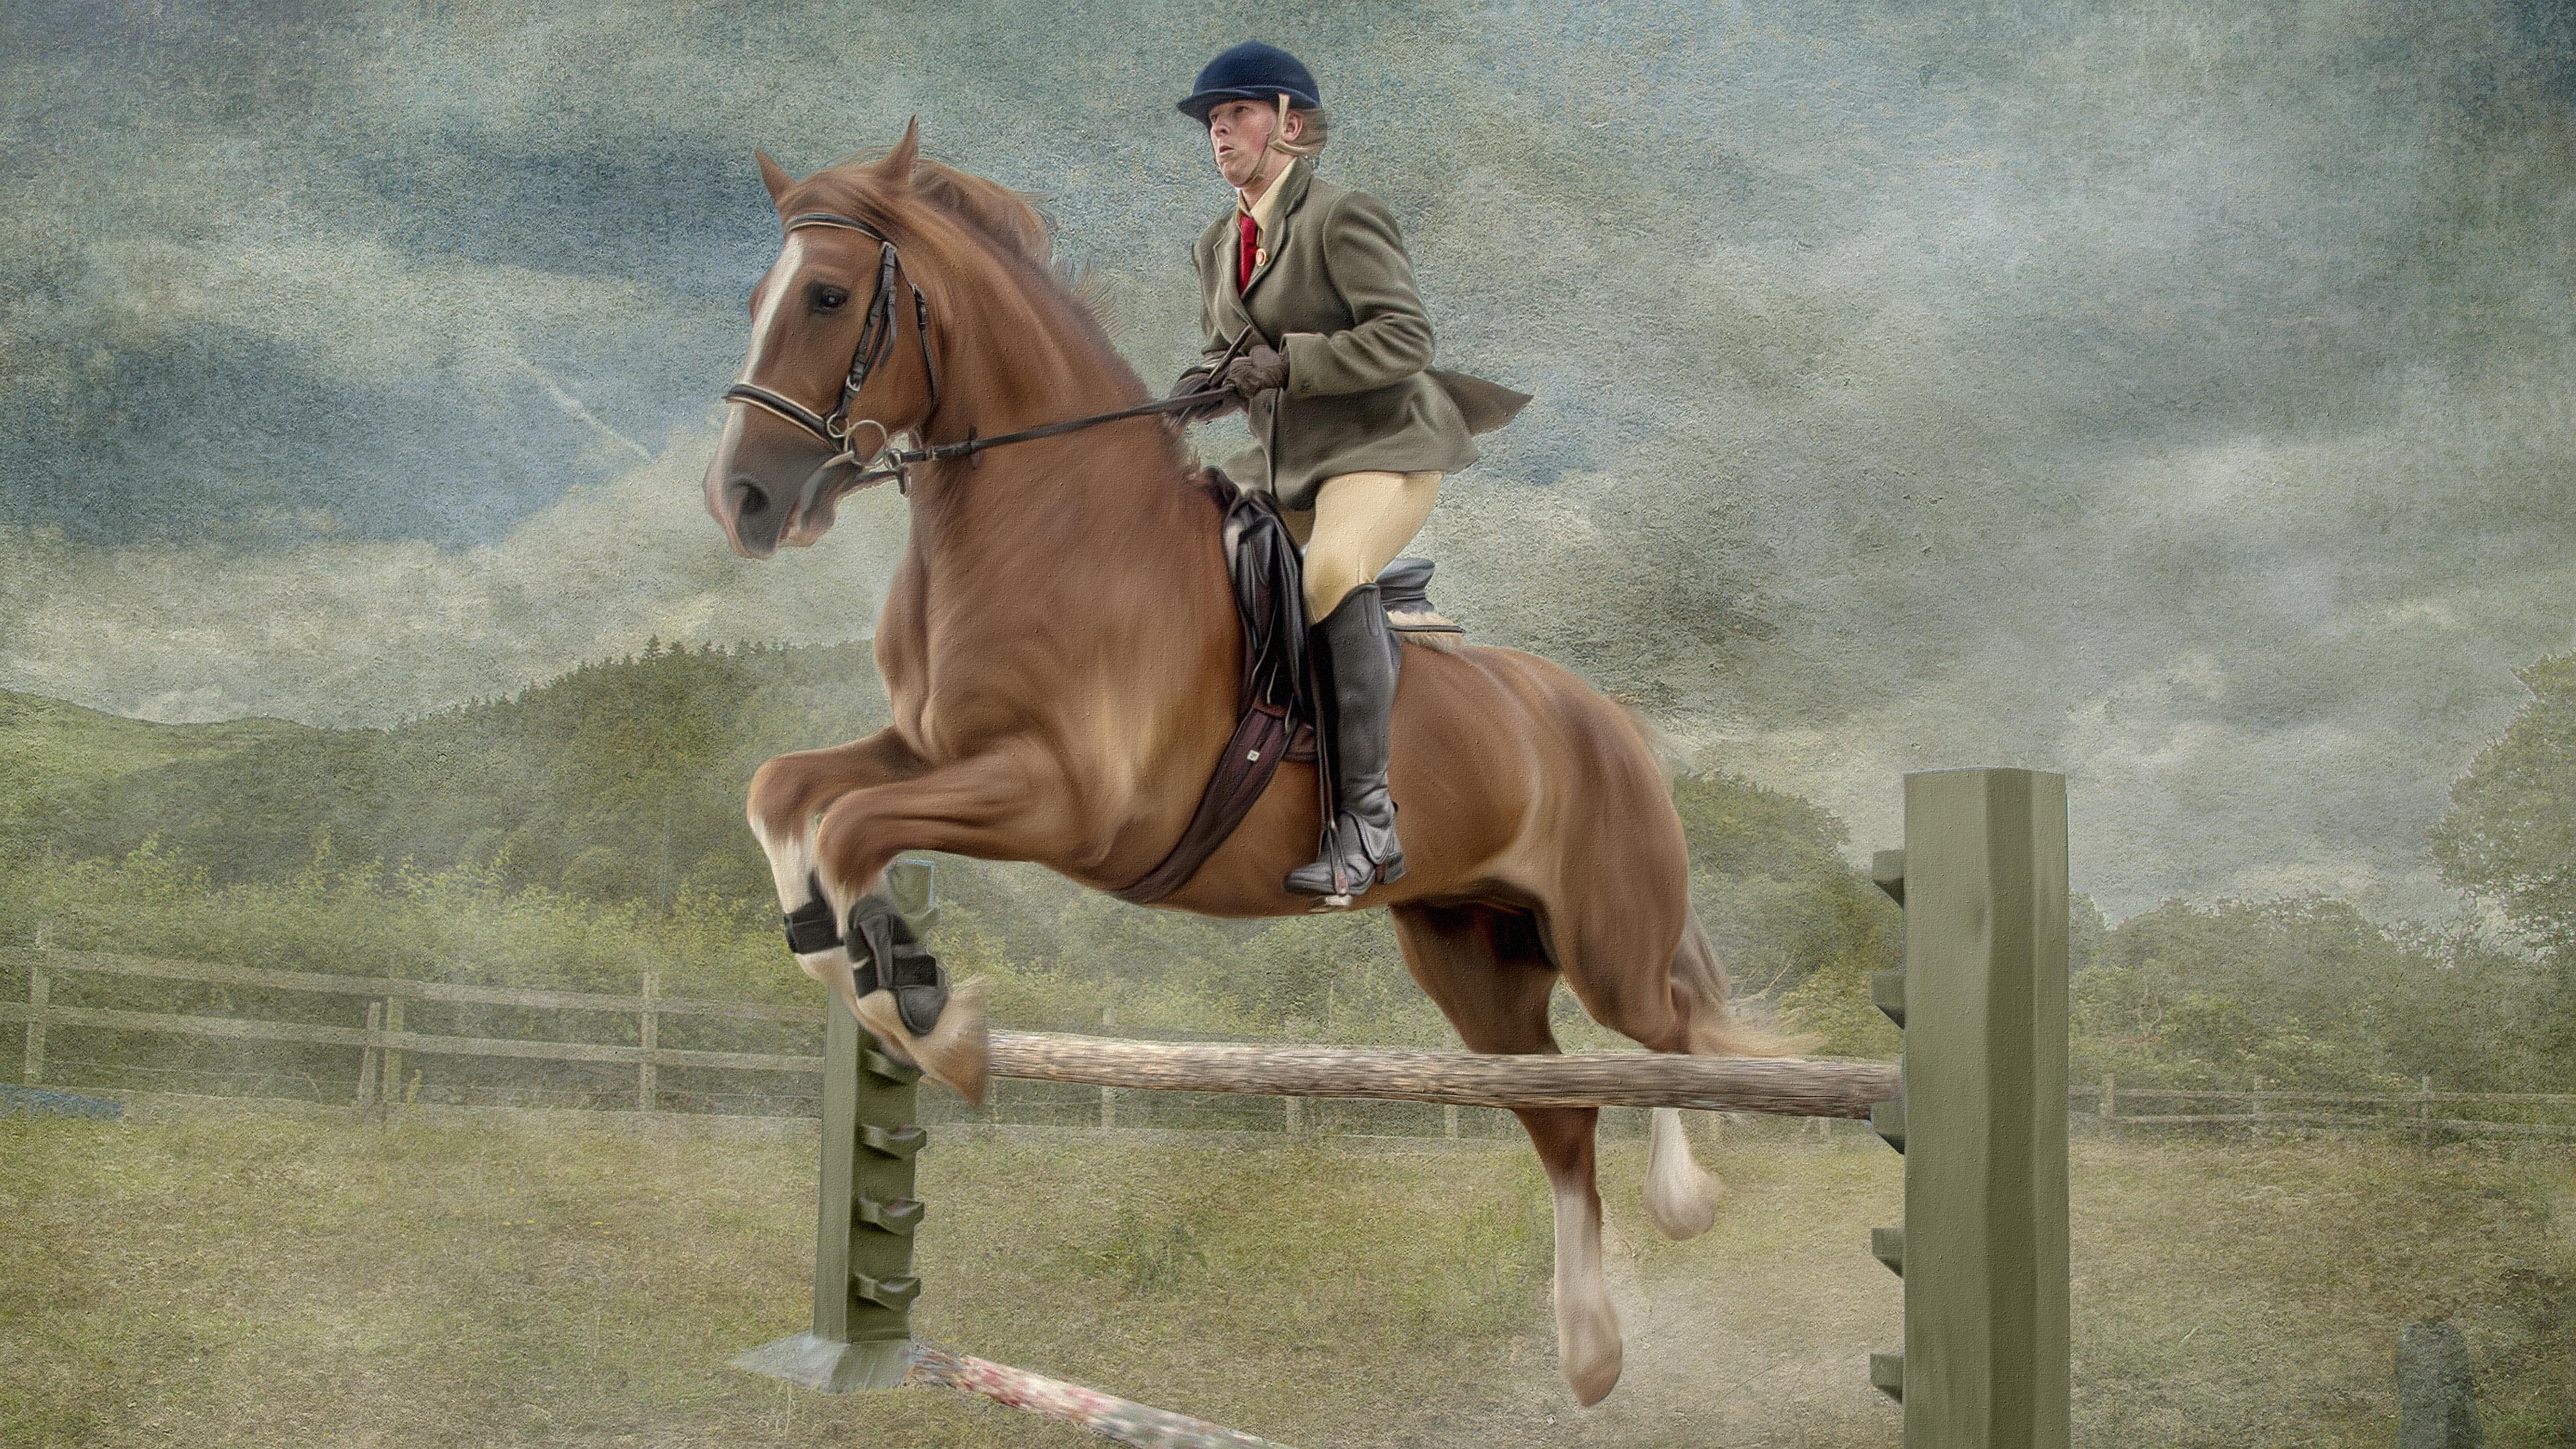 Desktop Wallpapers horse Man athletic Equestrian sport 3840x2160